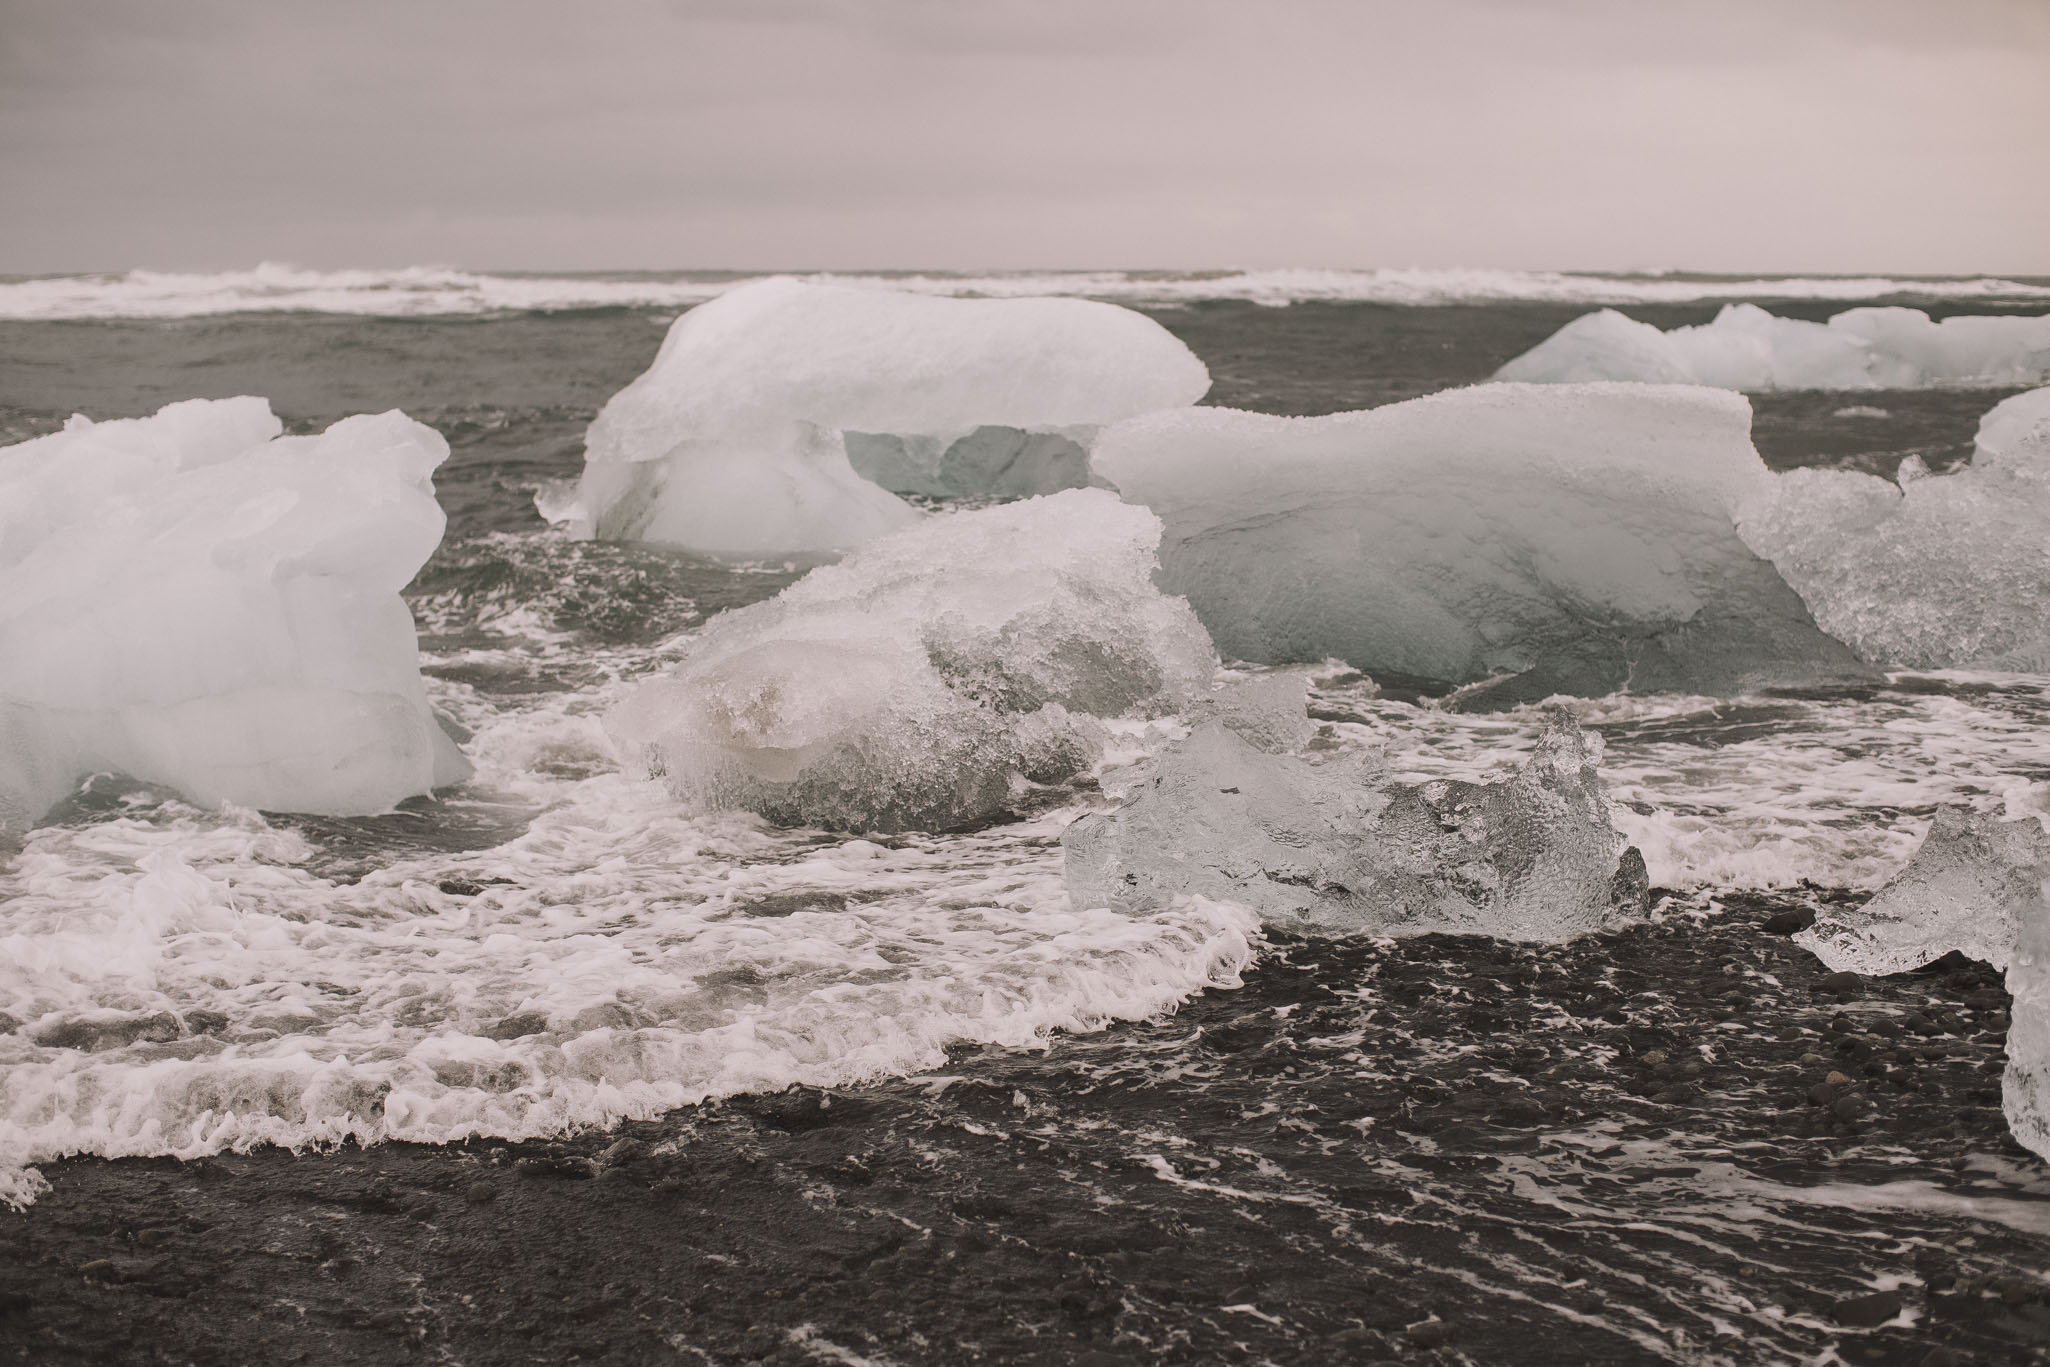 Road-trip-Islande-Iceland-Voyage-Travel-Portrait-Jérémy-Boyer-Jokulsarlon-Ice-Beach-plage-glace-12.jpg